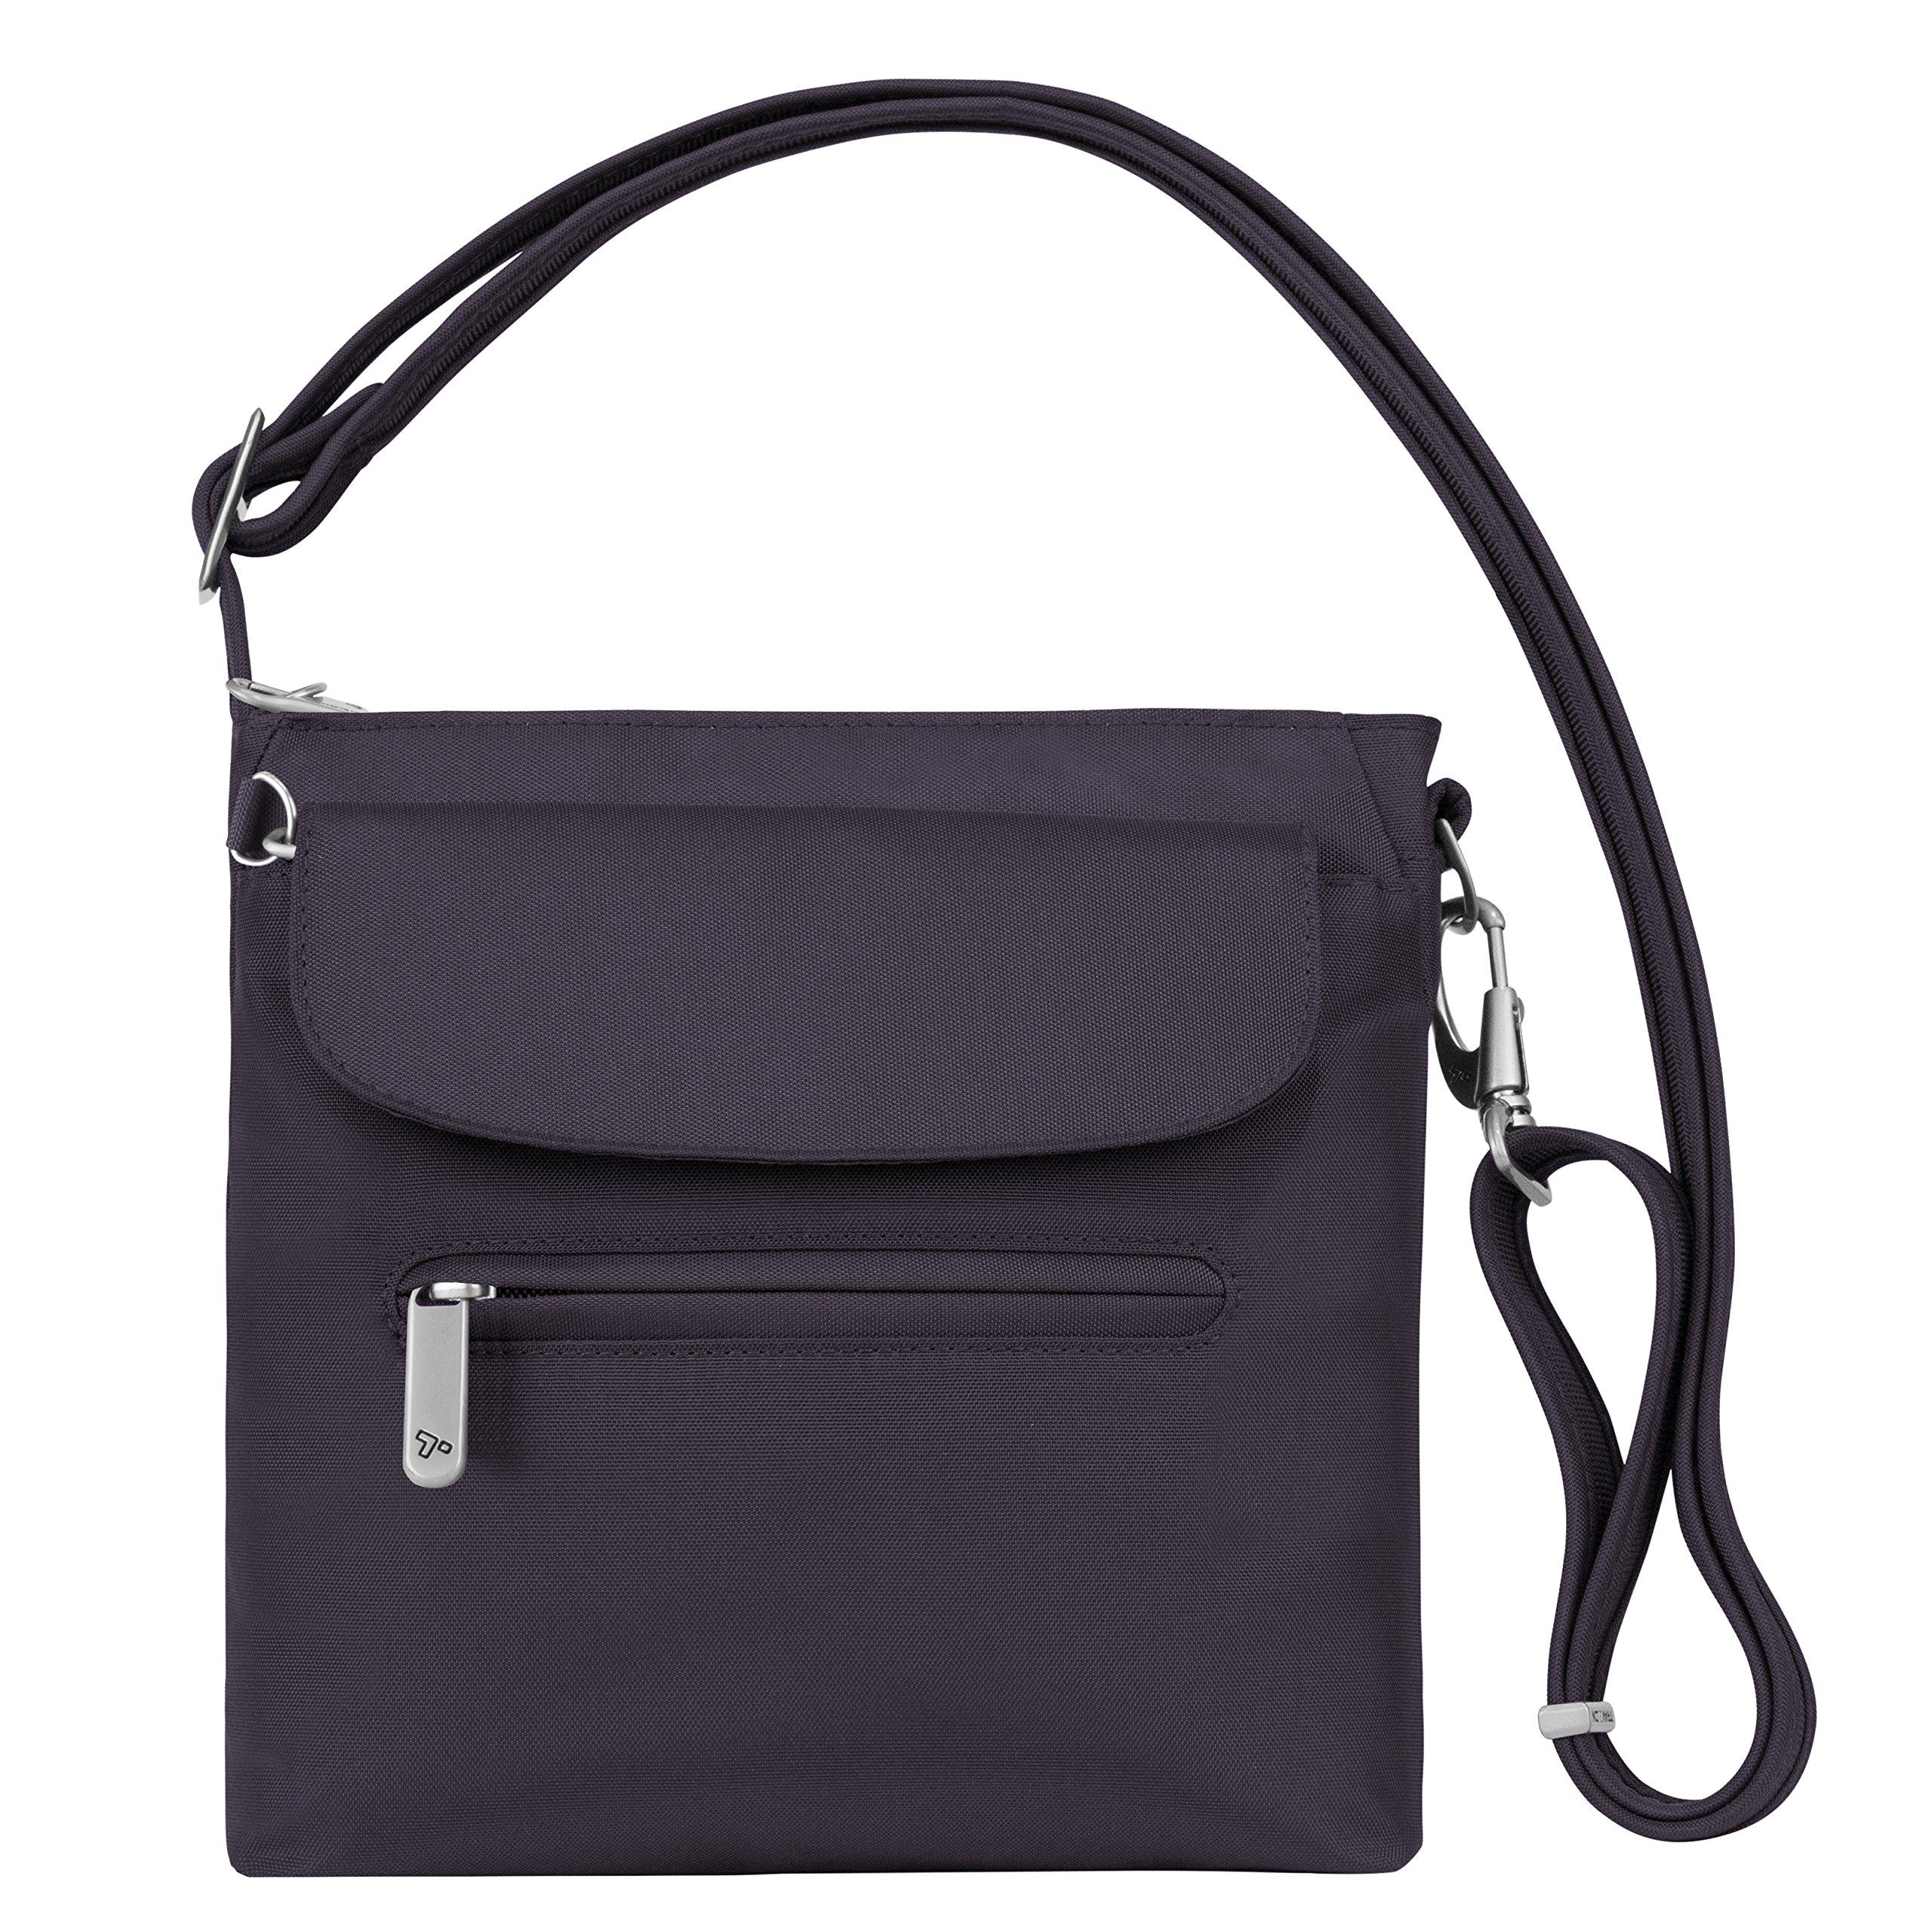 Travelon Women's Anti-Theft Classic Mini Shoulder Bag Sling Tote, Purple, One Size by Travelon